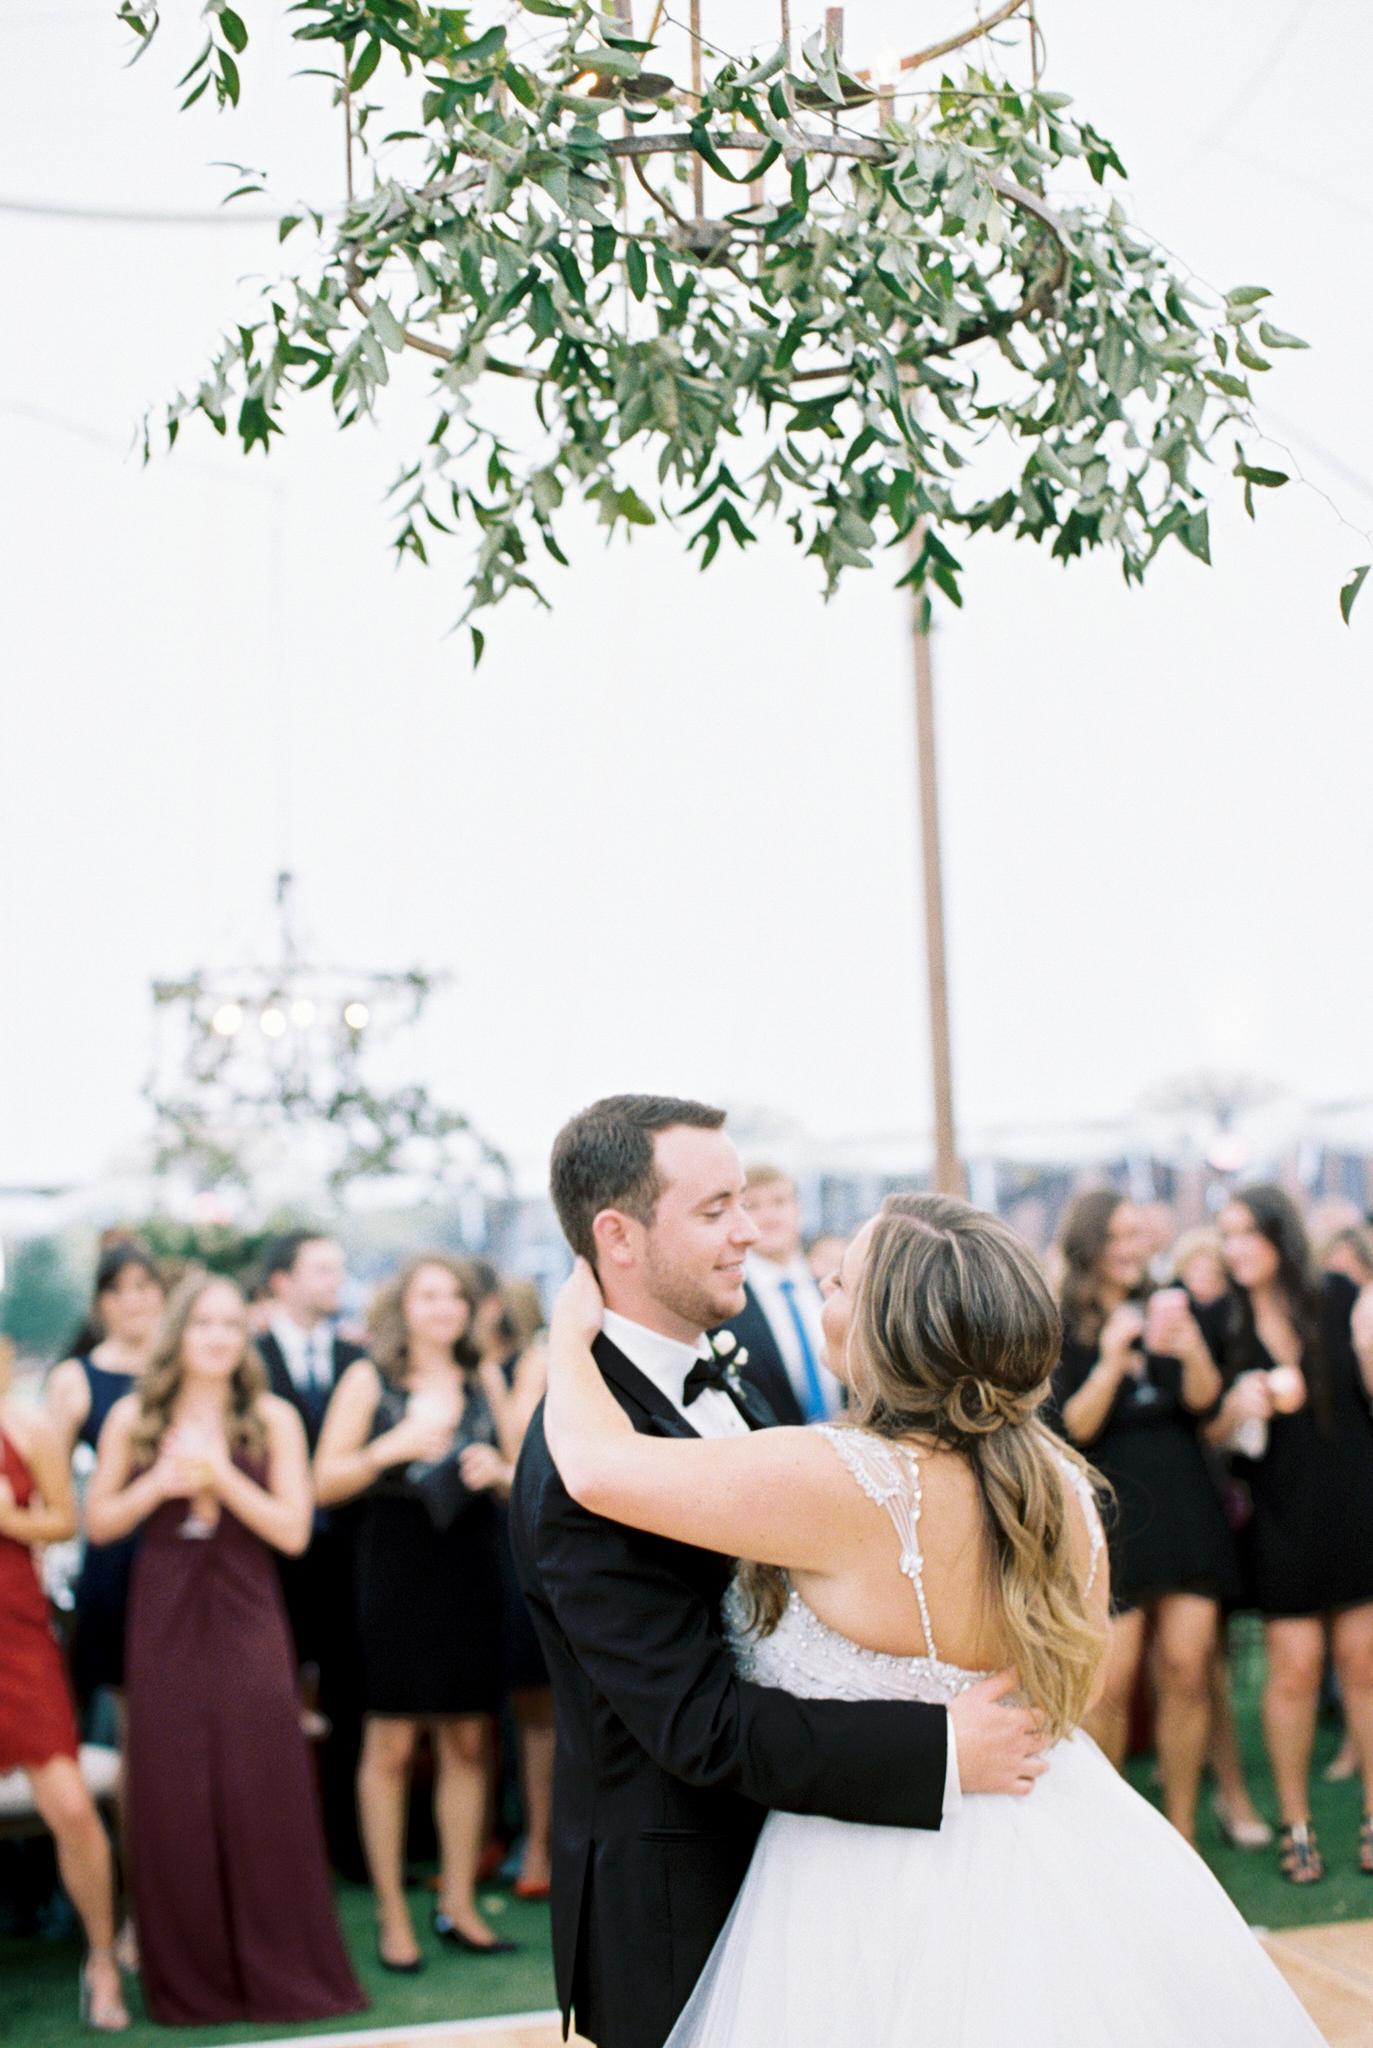 brittany alex wedding first dance